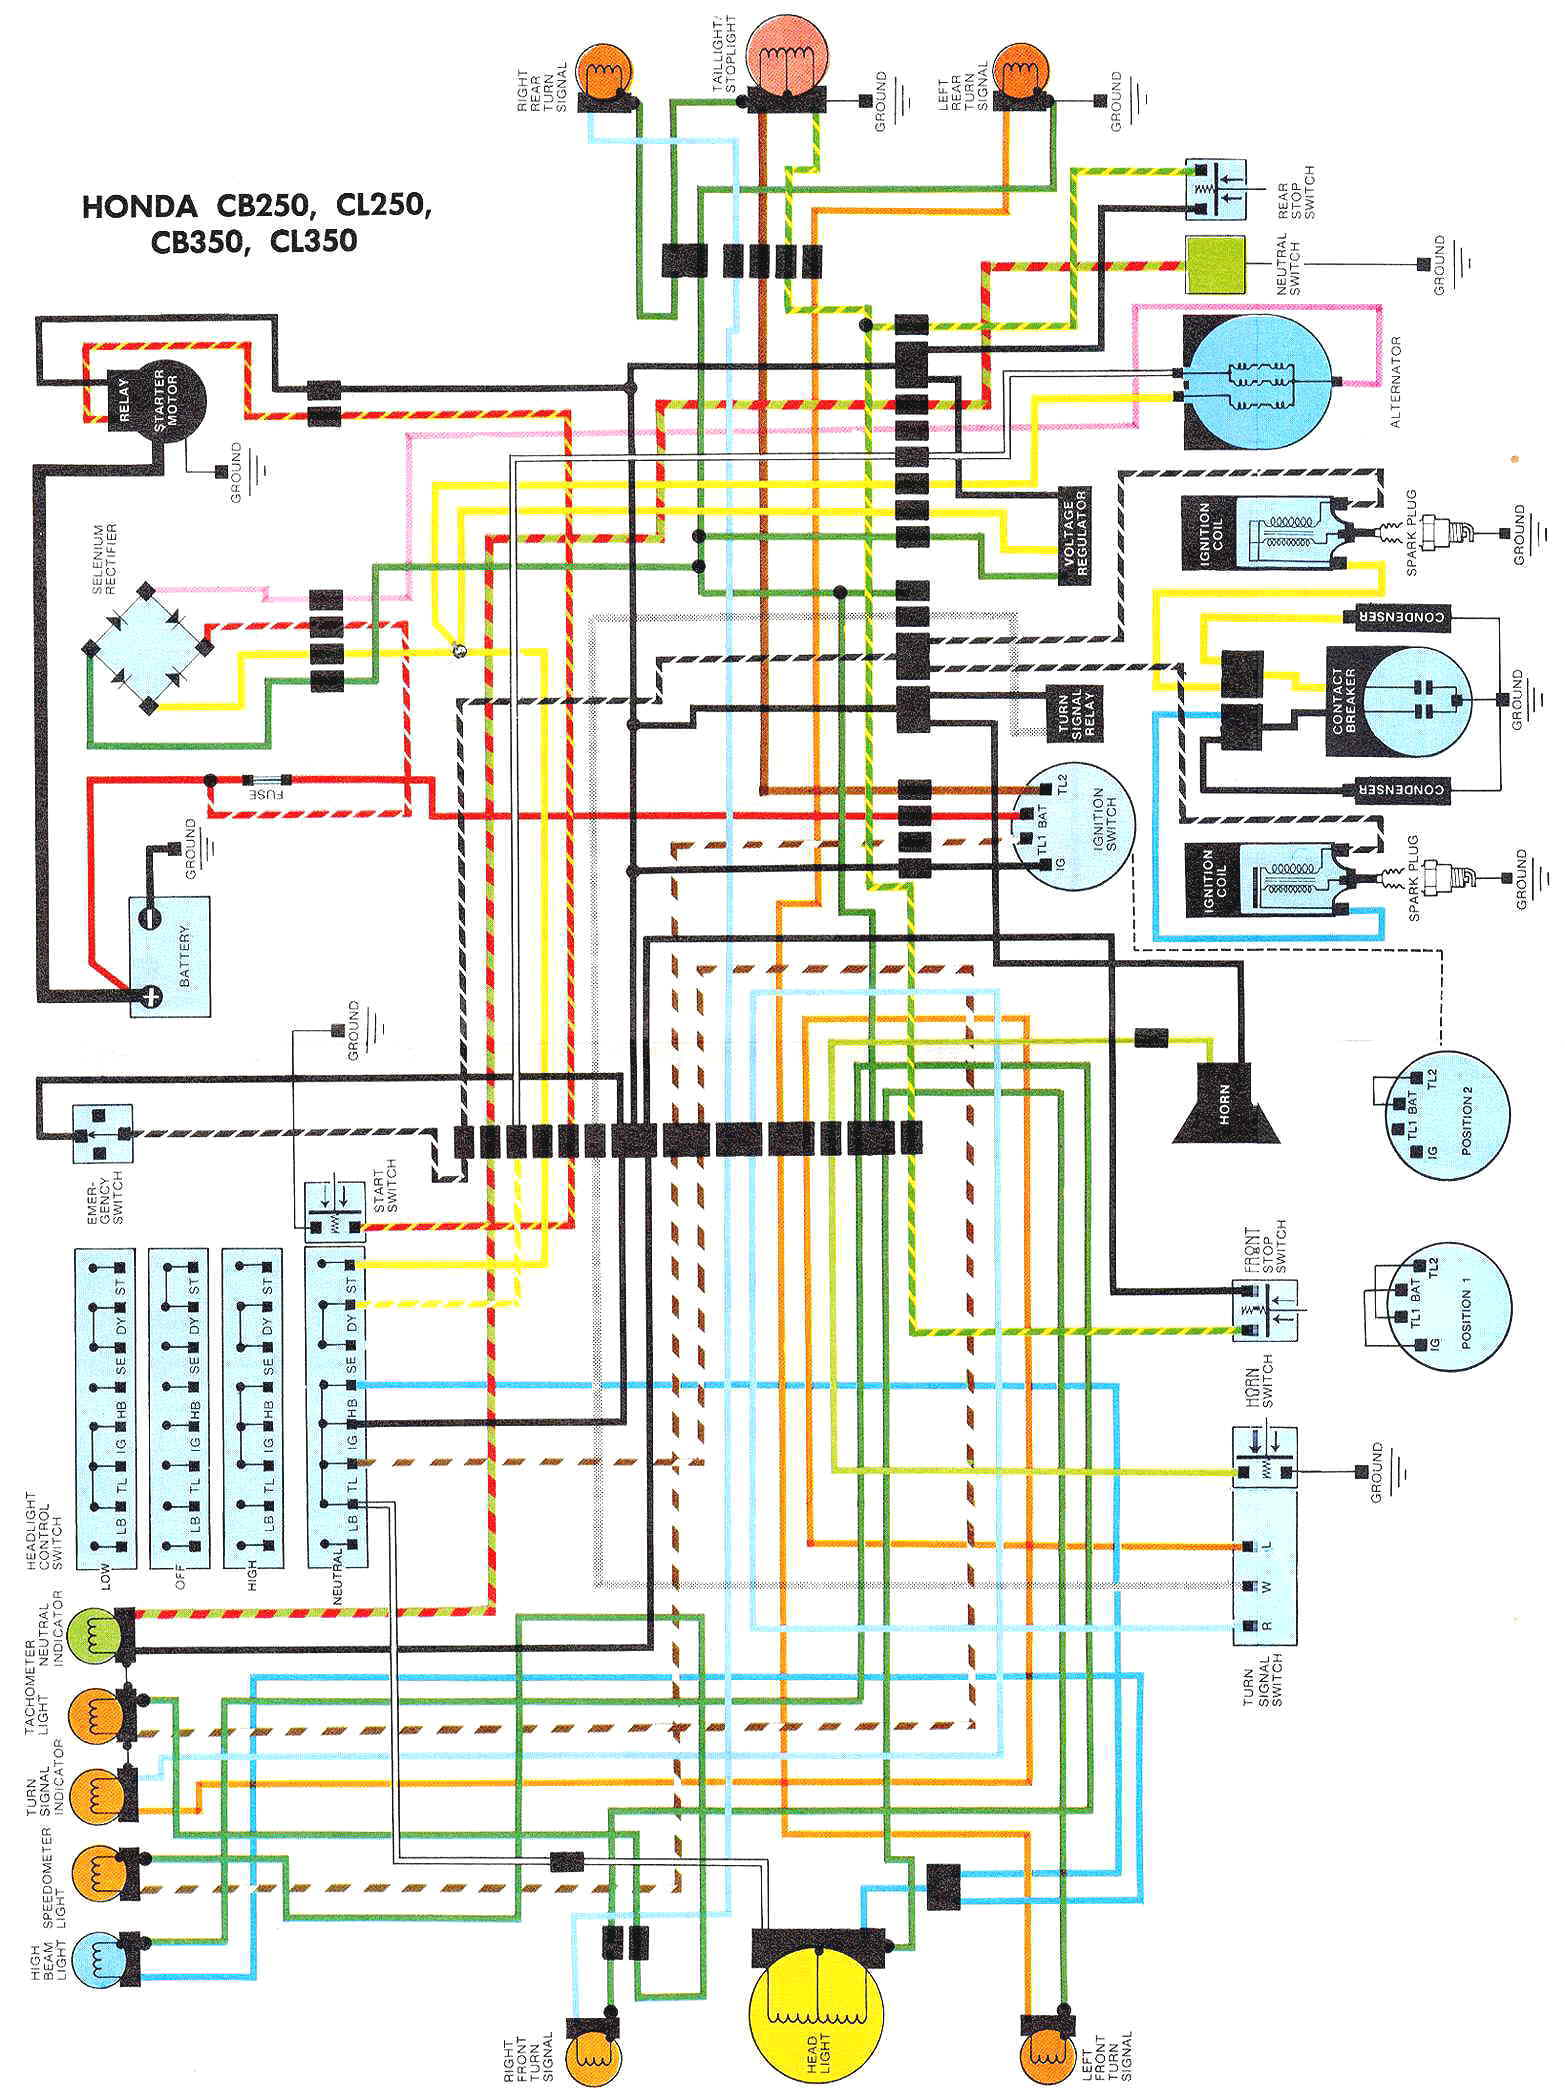 73 cb350g right switch wiring rh hondatwins net 71 Honda 450 1970 Honda CB450 On Craigslist